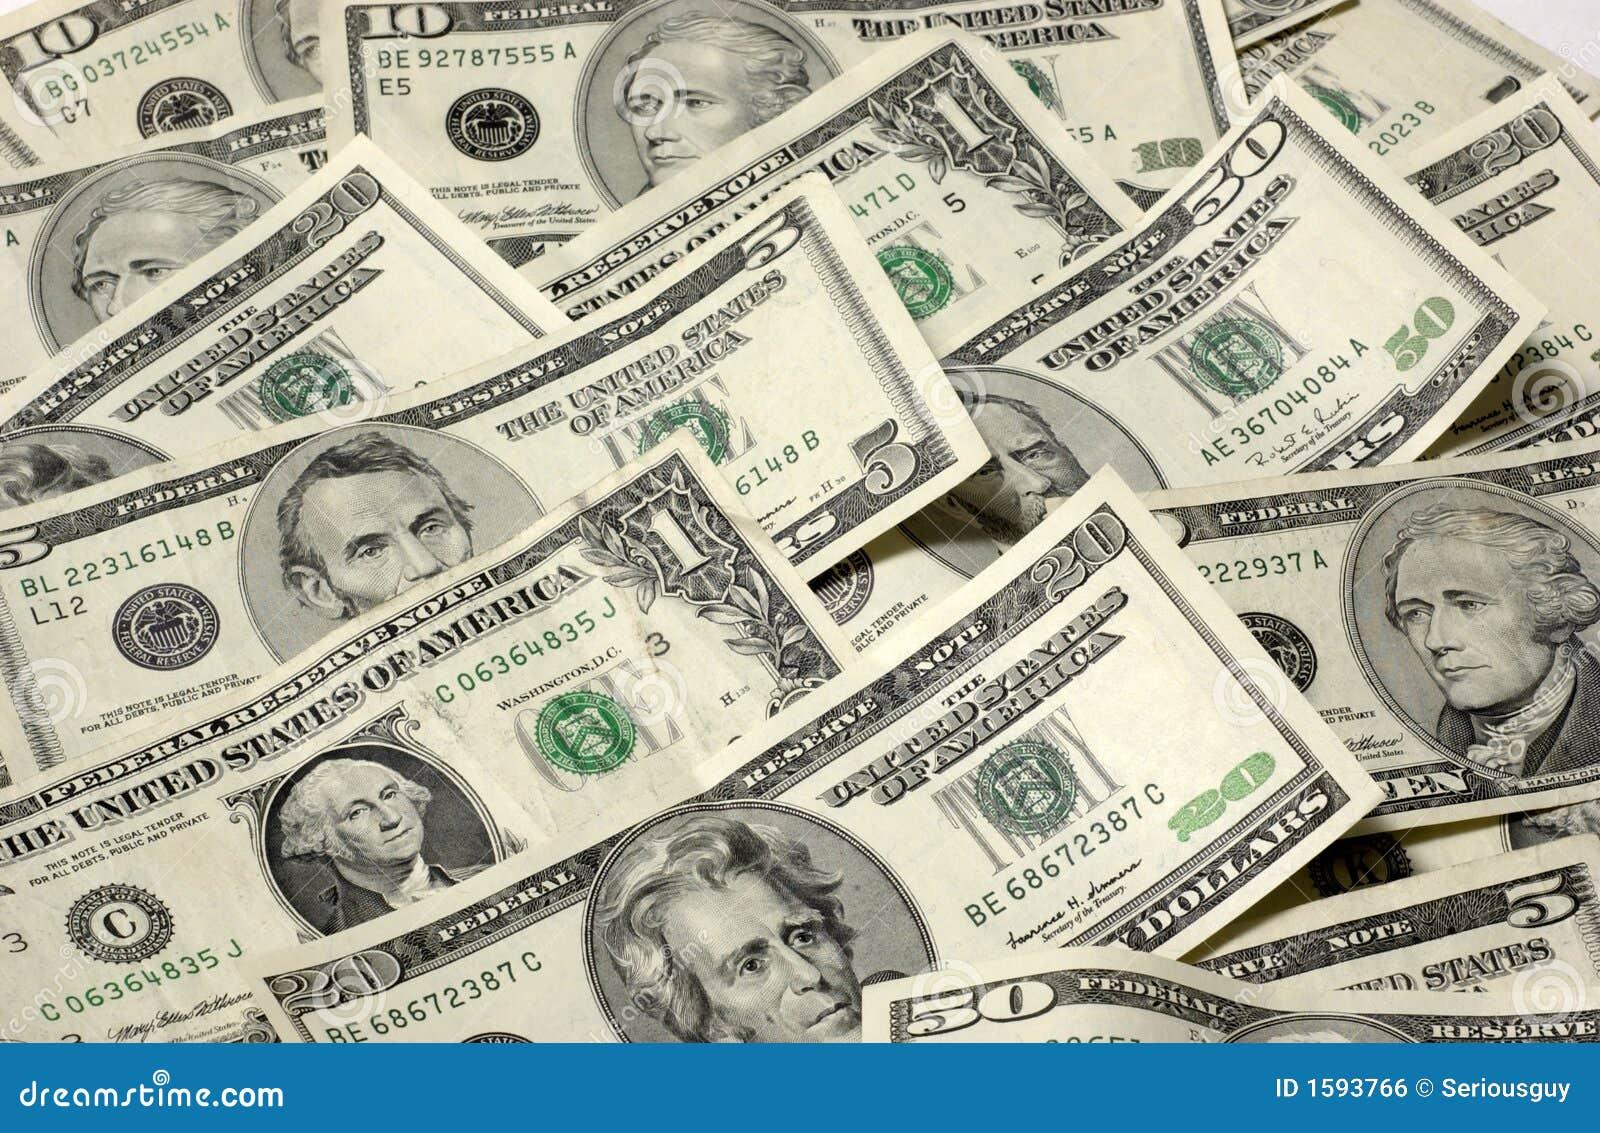 Money management essay